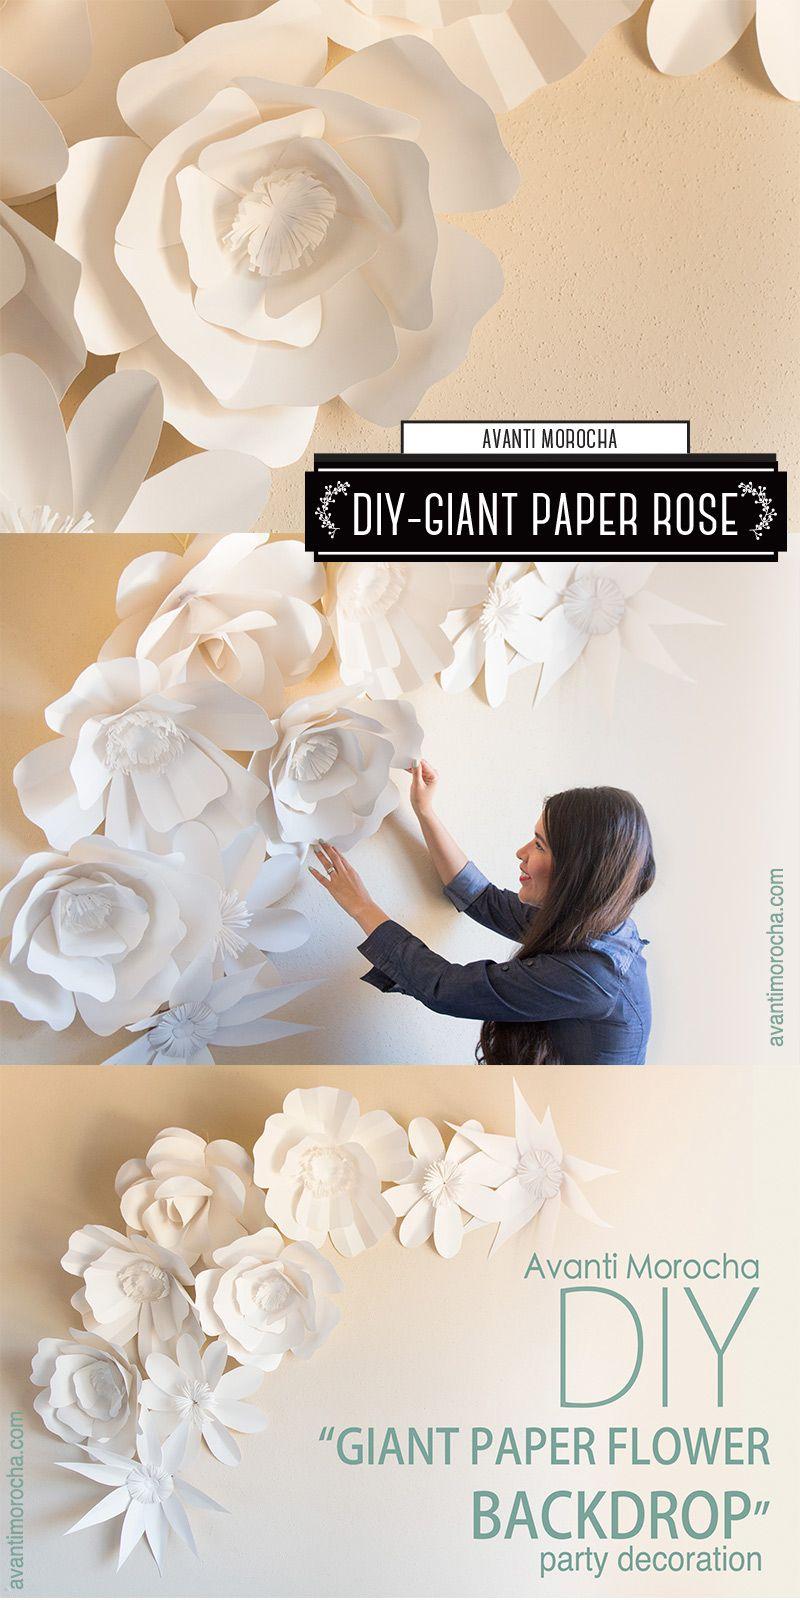 DIY Giant Paper Rose  DIY  Pinterest  Paper flower backdrop